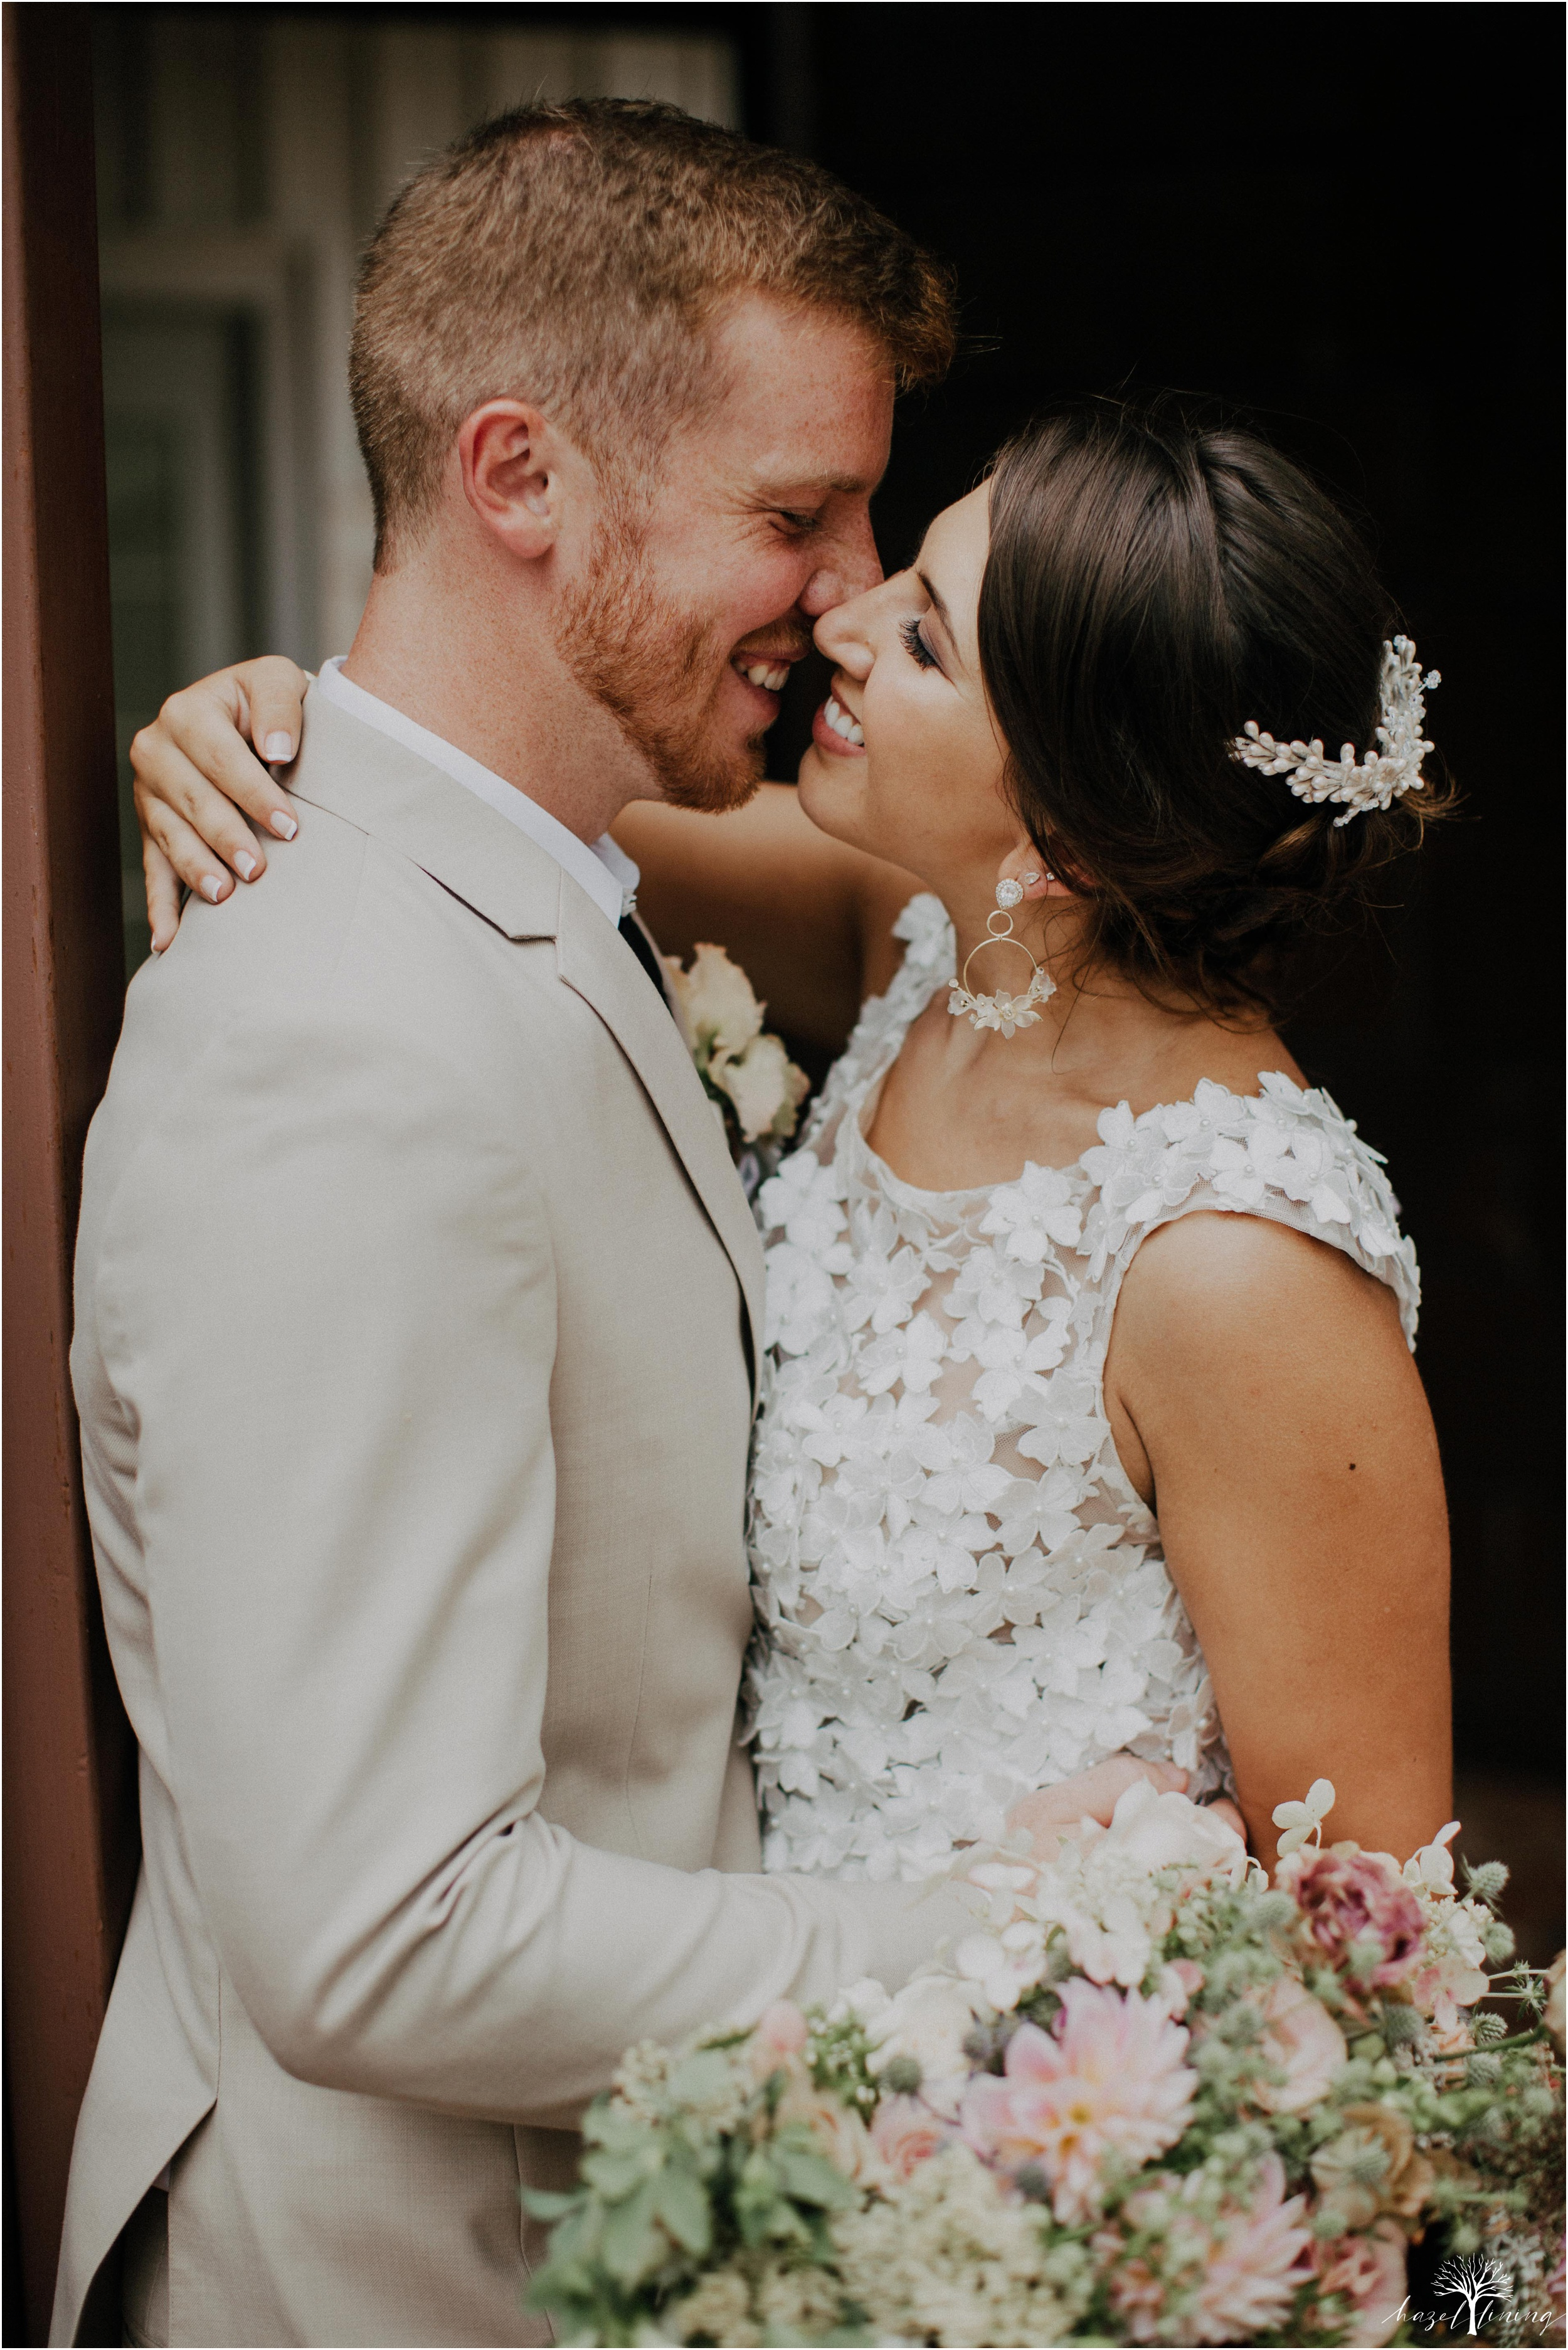 carl-chloe-the-ryland-inn-whitehouse-station-new-jersey-styled-squad-hazel-lining-photography-destination-elopement-wedding-engagement-photography_0017.jpg